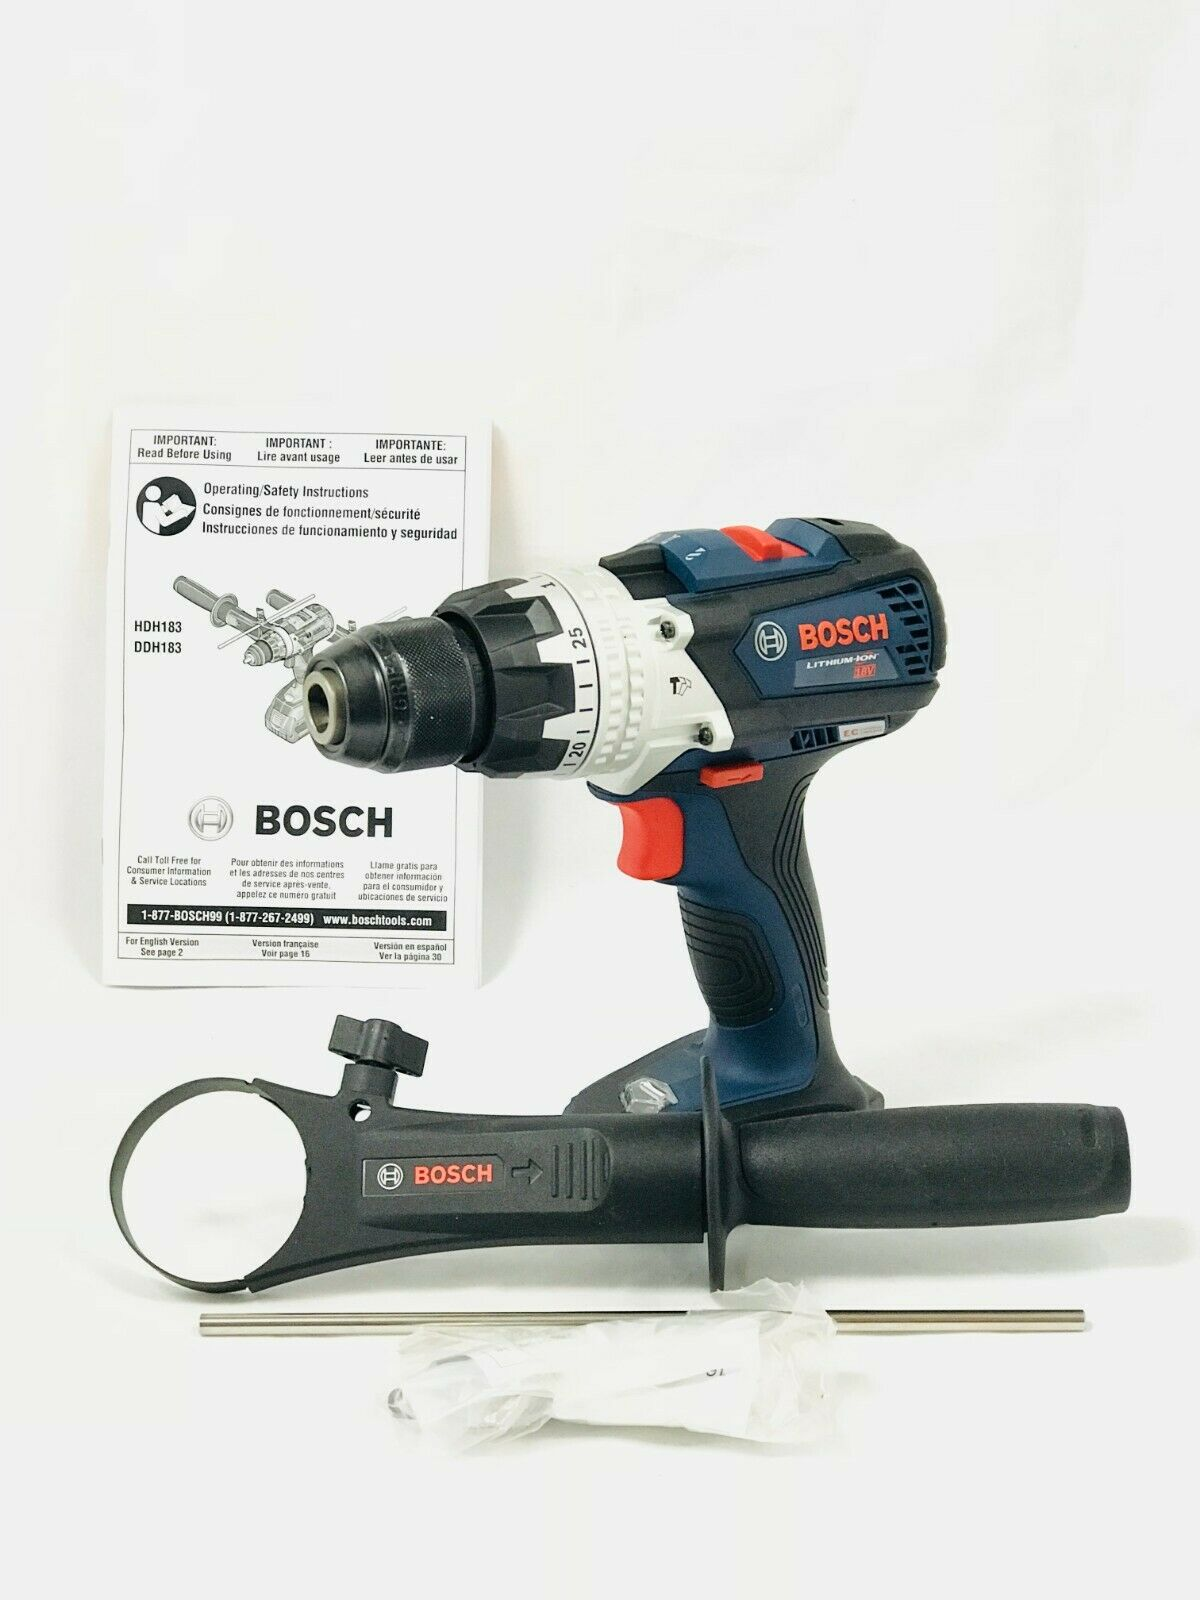 Bosch HDH183B Hammer Drill Driver  18V EC Brushless Brute Tough 1 2 In.